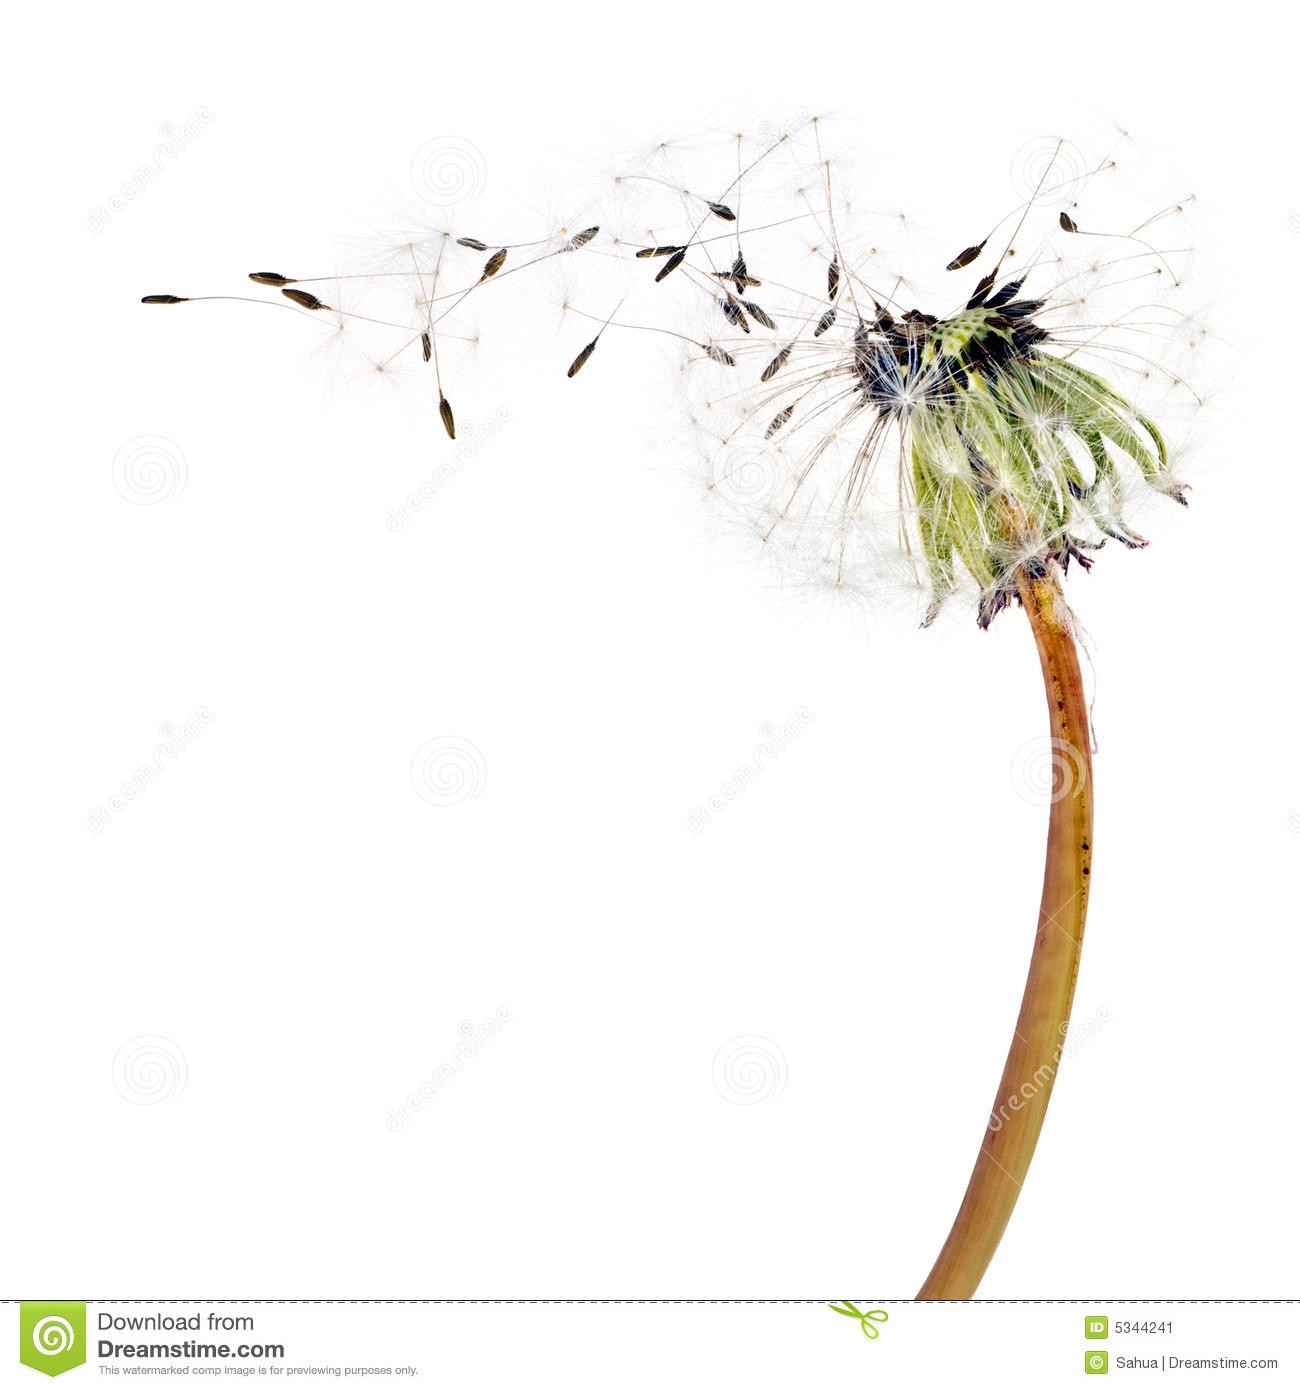 Flying Dandelion Seeds Stock Image.